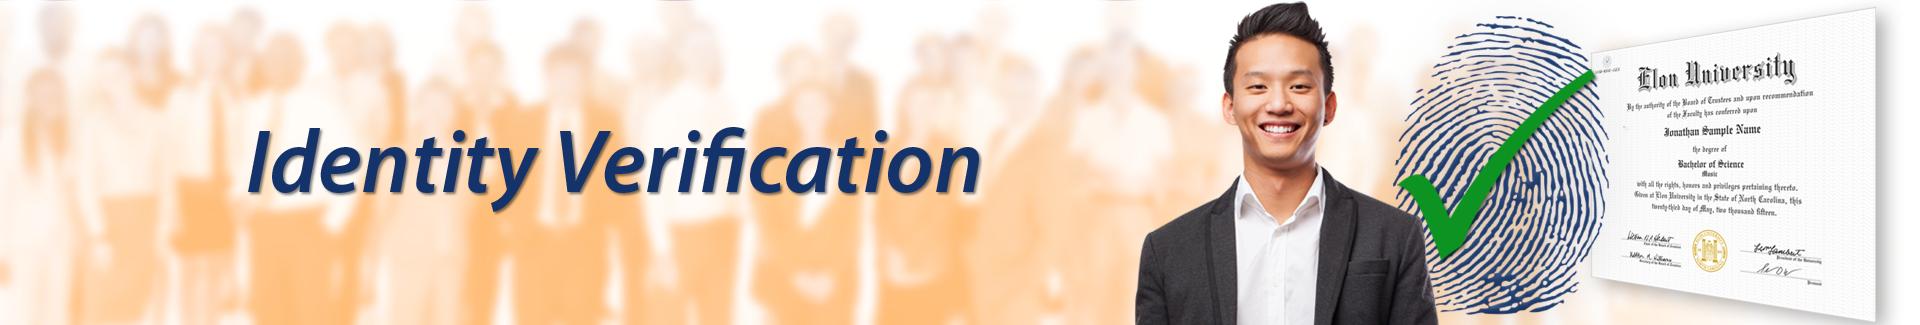 Solutions - Identity Verification logo background